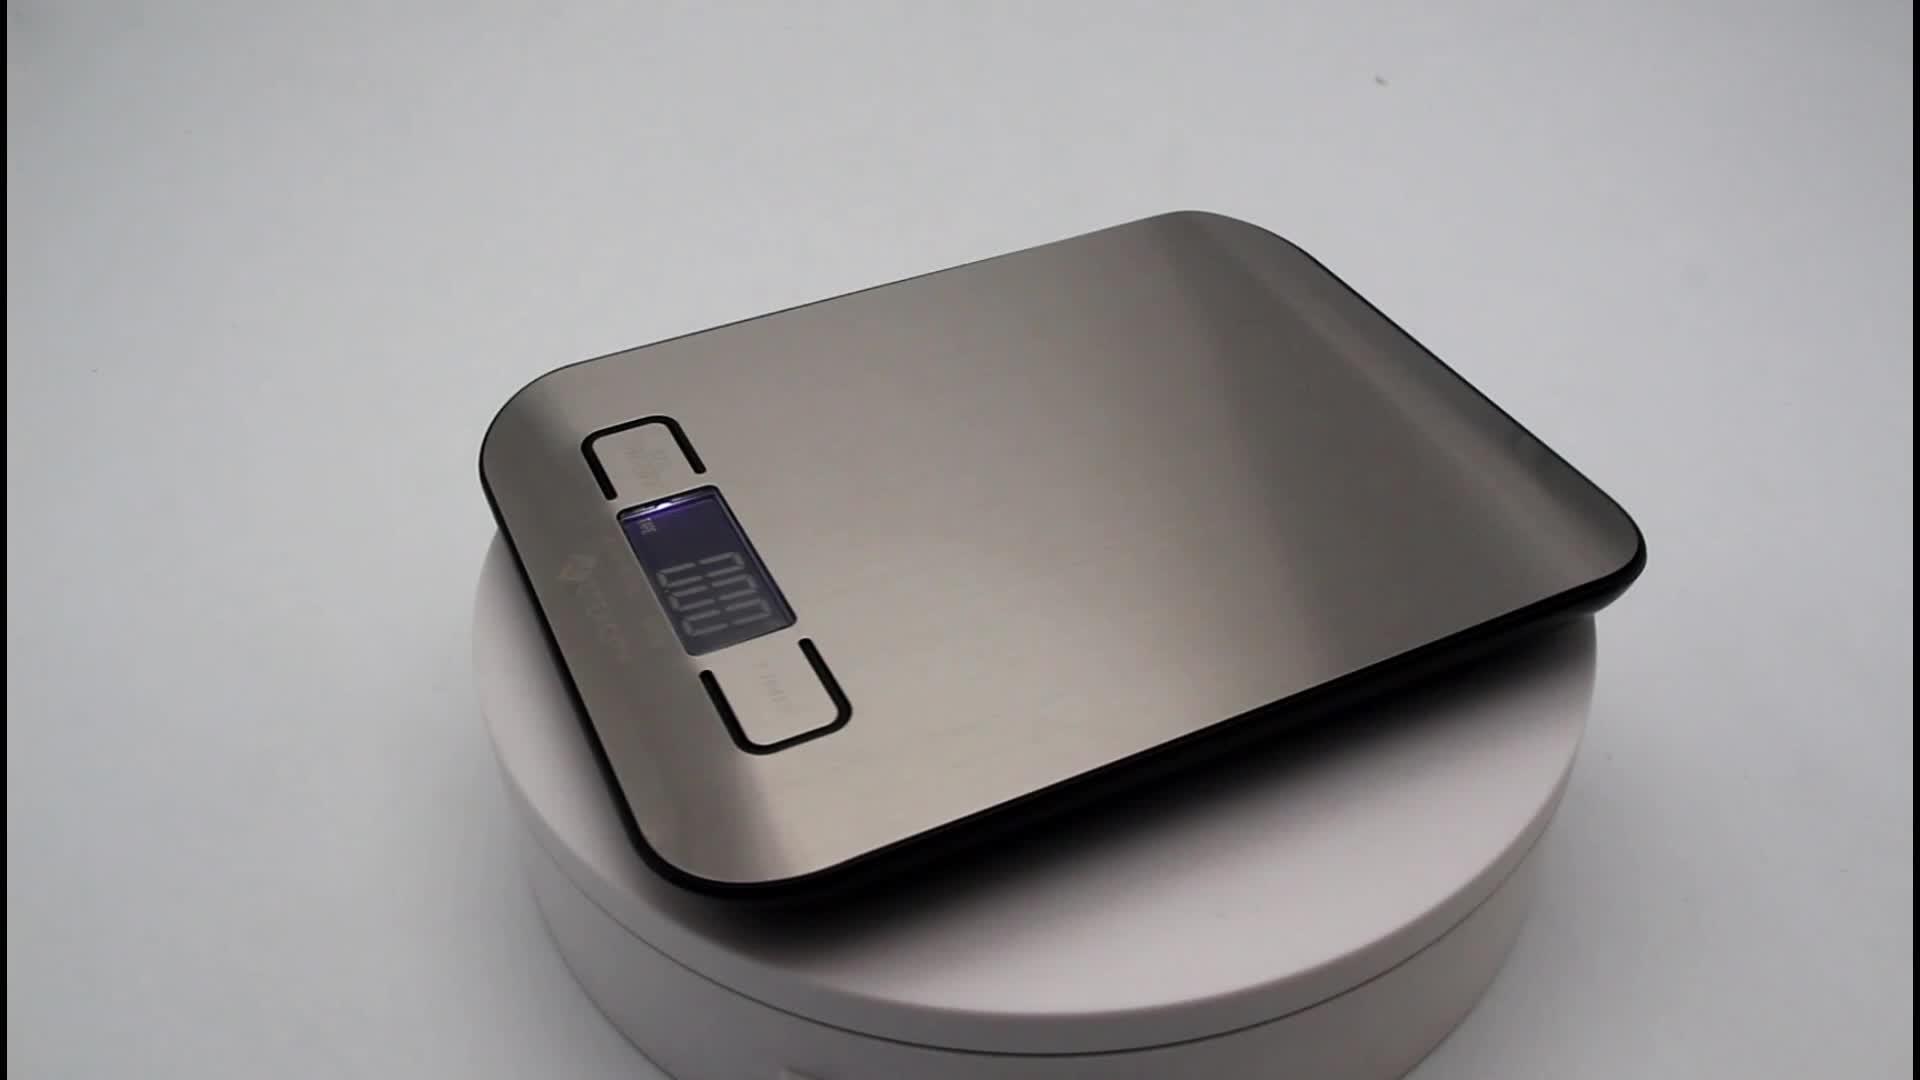 Pinxin สแตนเลสสตีล 5 กิโลกรัมเครื่องชั่งน้ำหนัก Etekcity อาหารดิจิตอลโภชนาการ scale